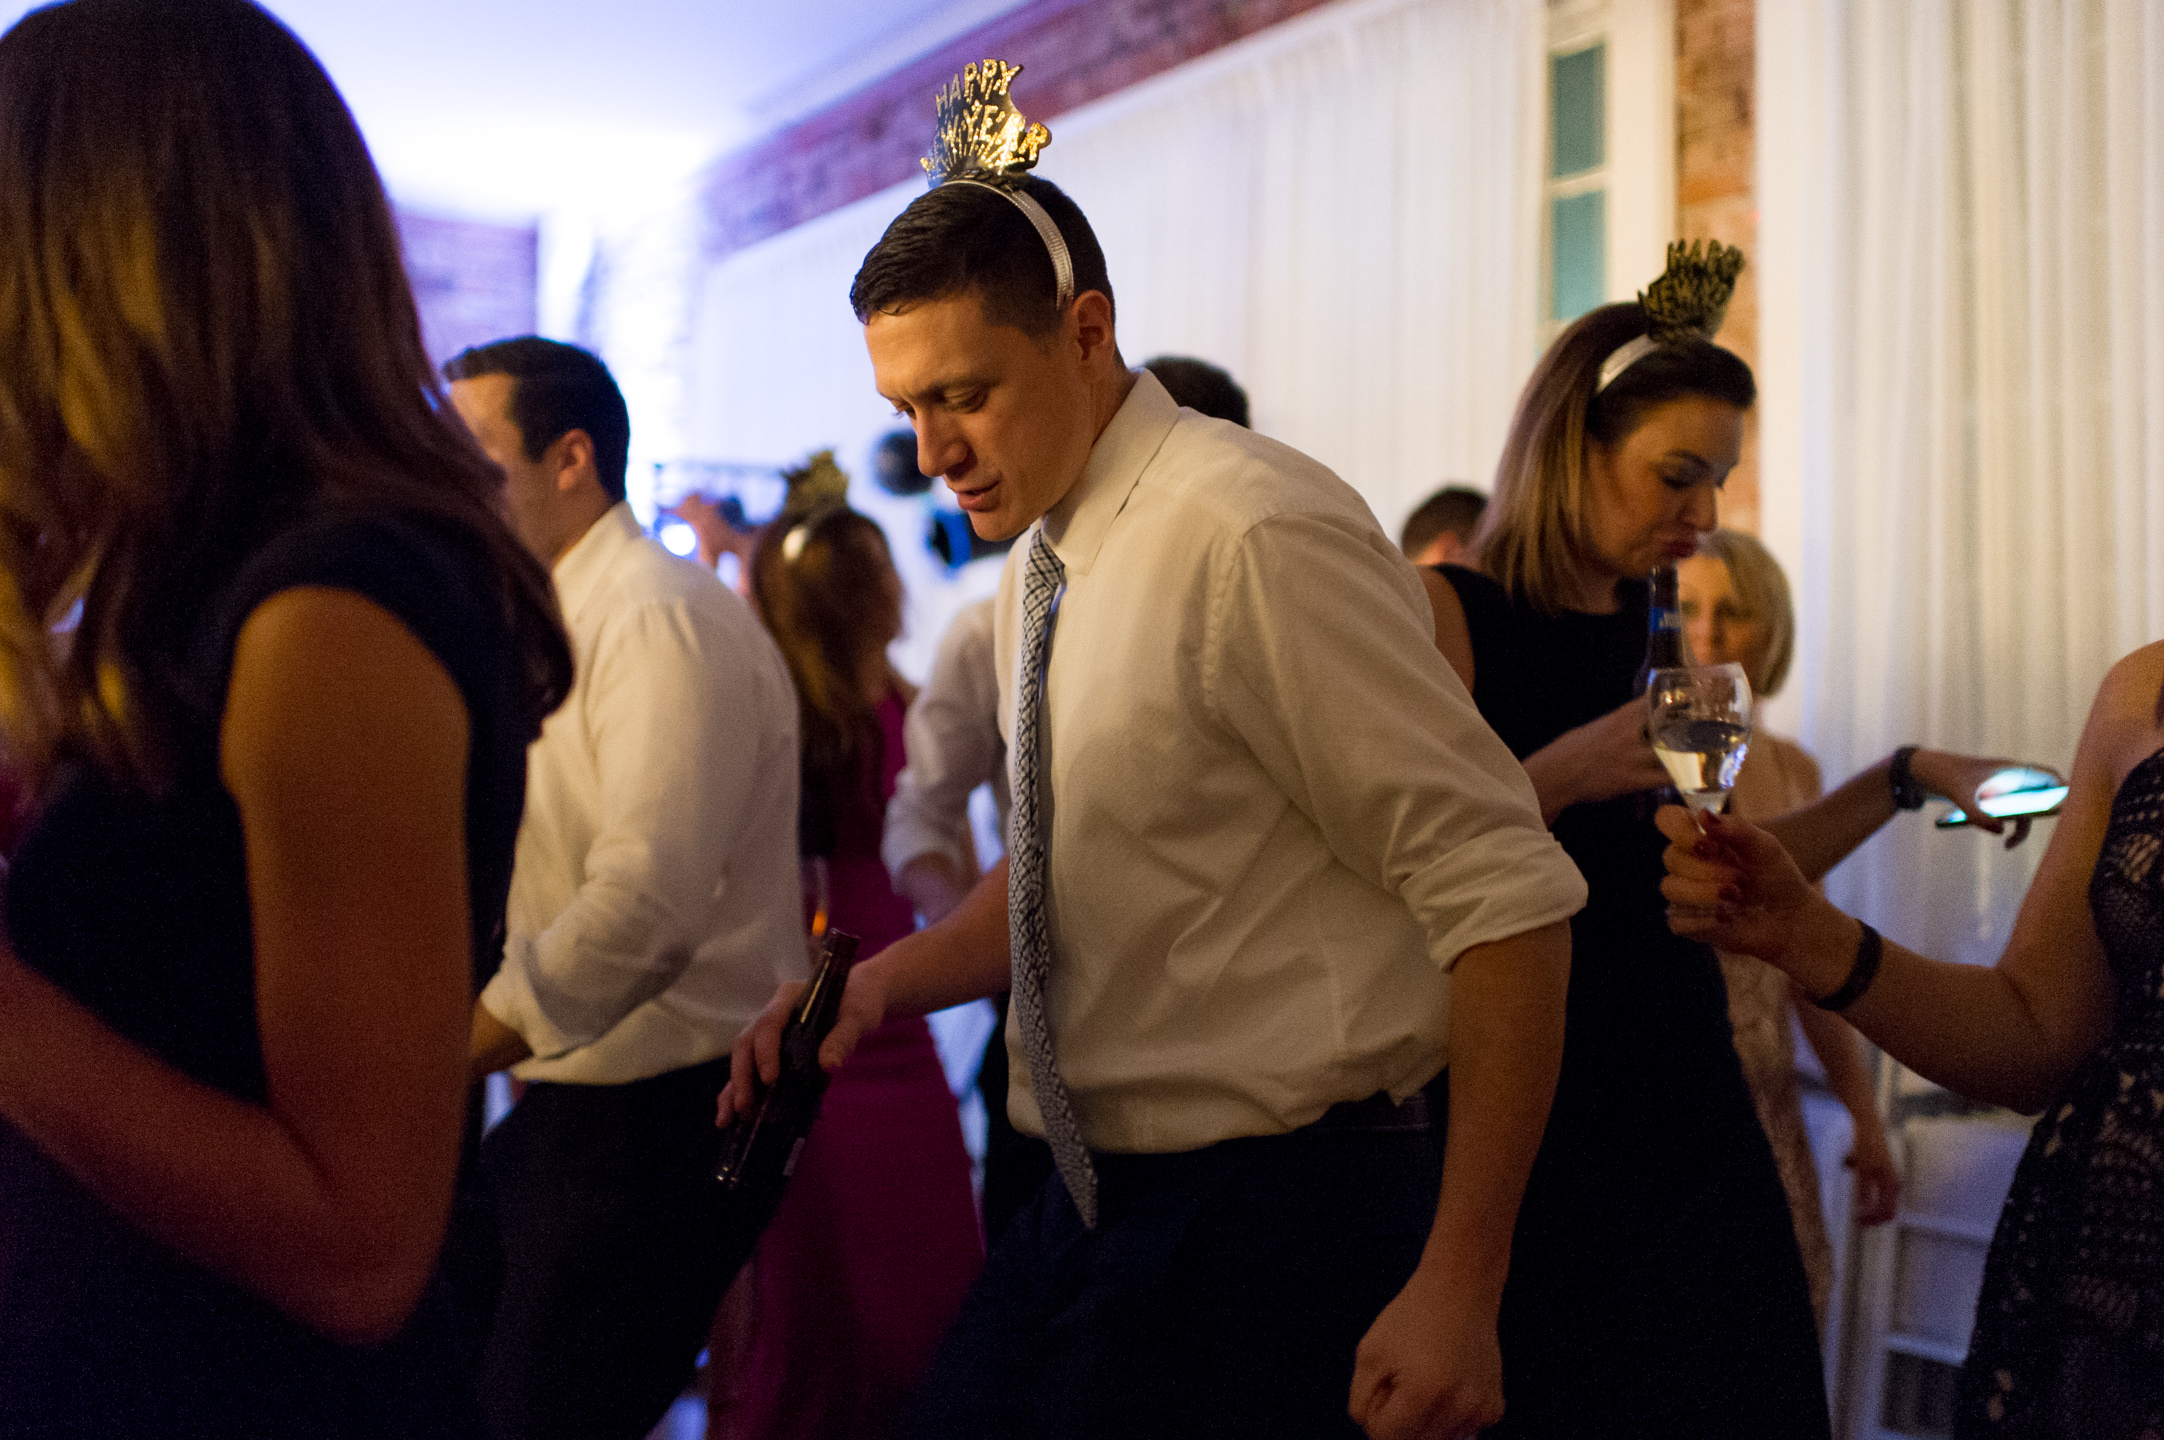 20161231_Tat_Marian and Joe Wedding-155.jpg